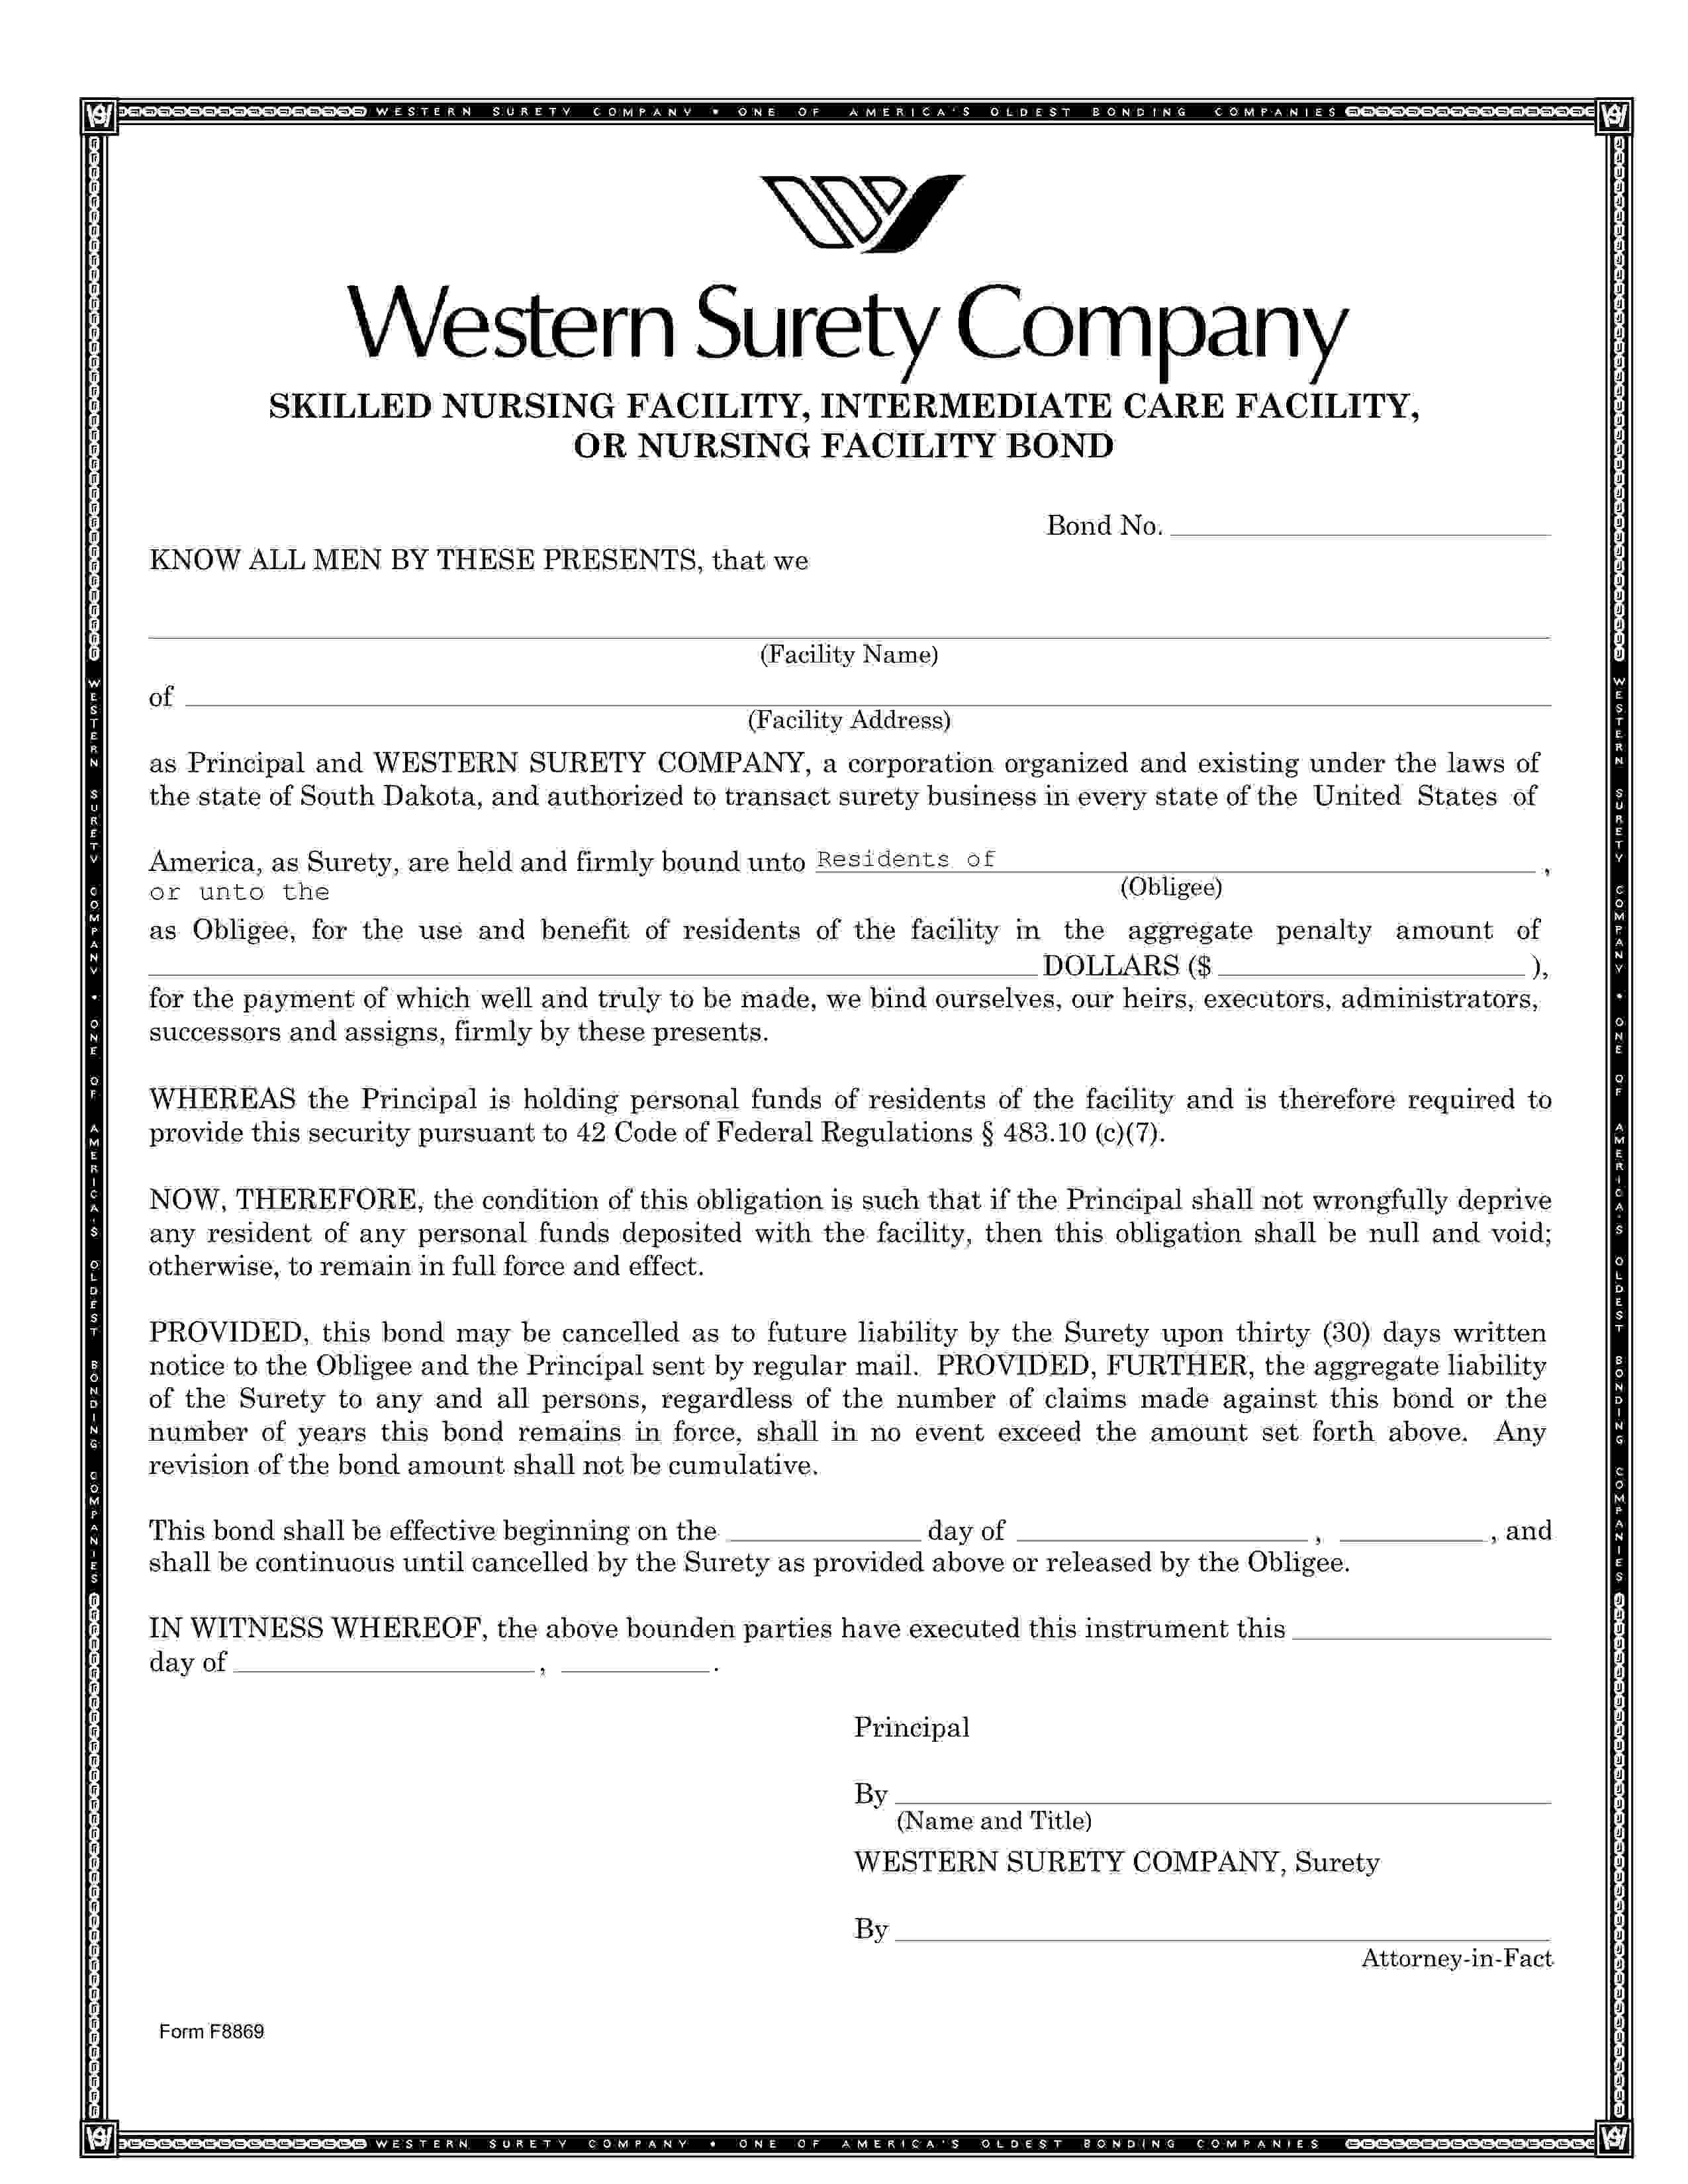 Nursing Facility Resident Trust Fund Bond sample image